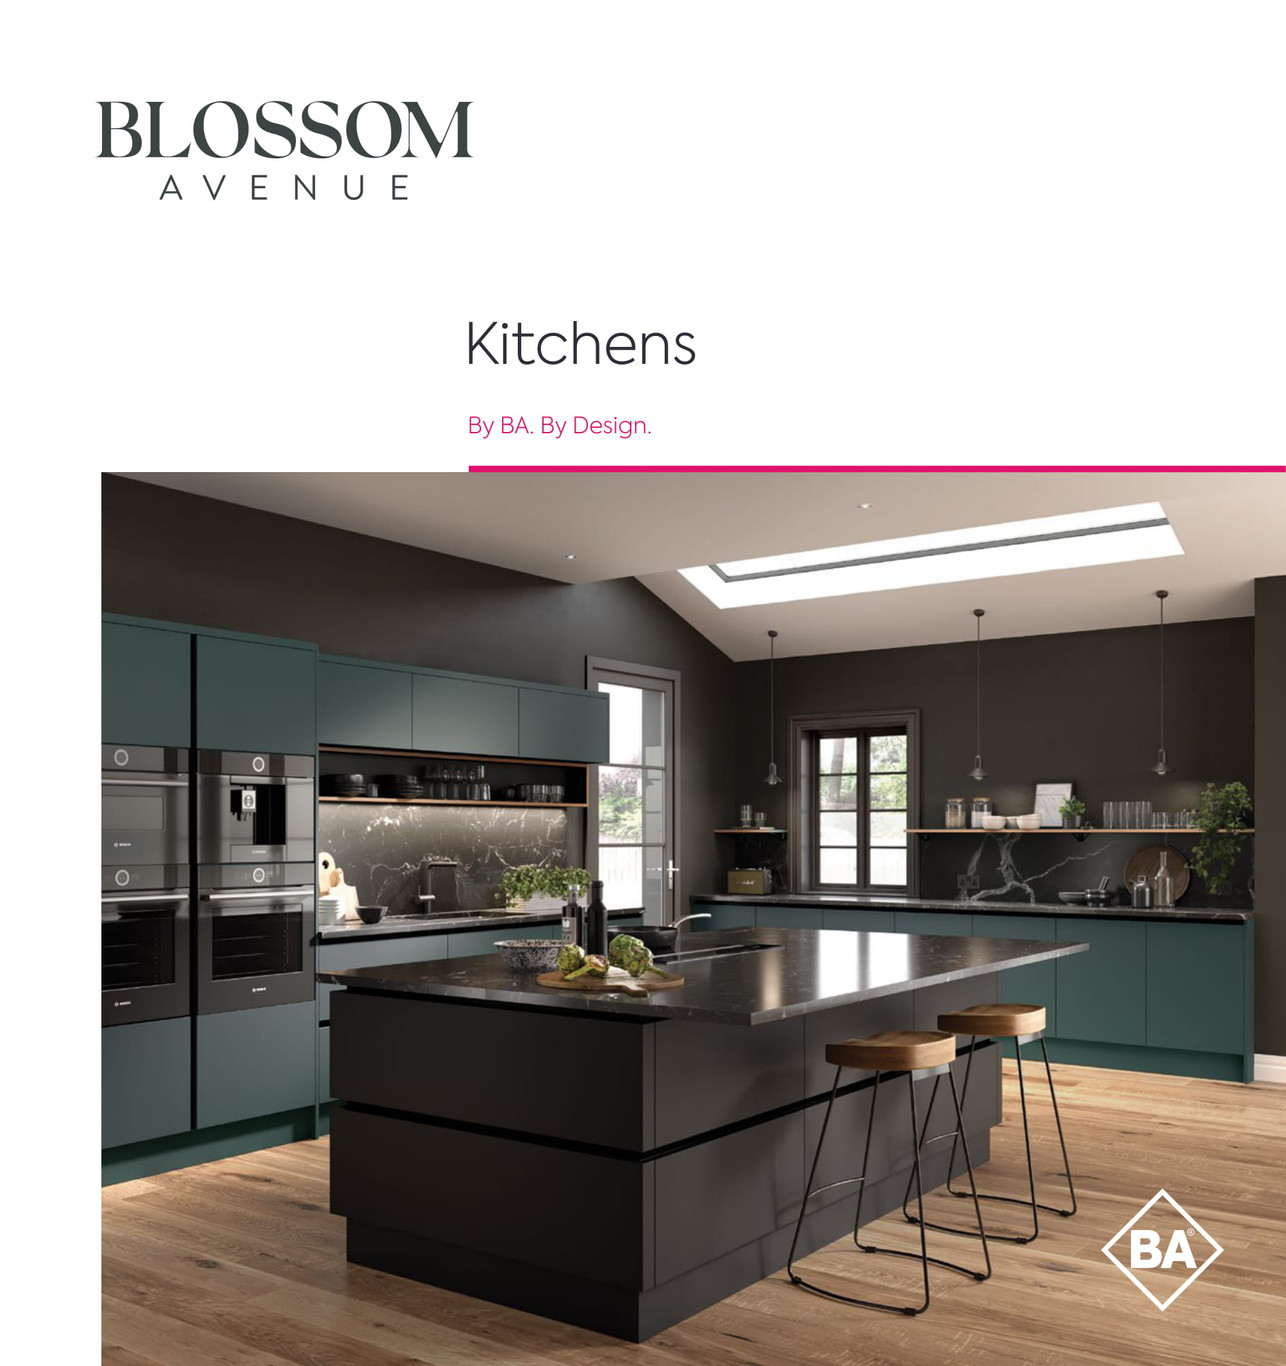 blossom-avenue-kitchen-brochure-2020-01.